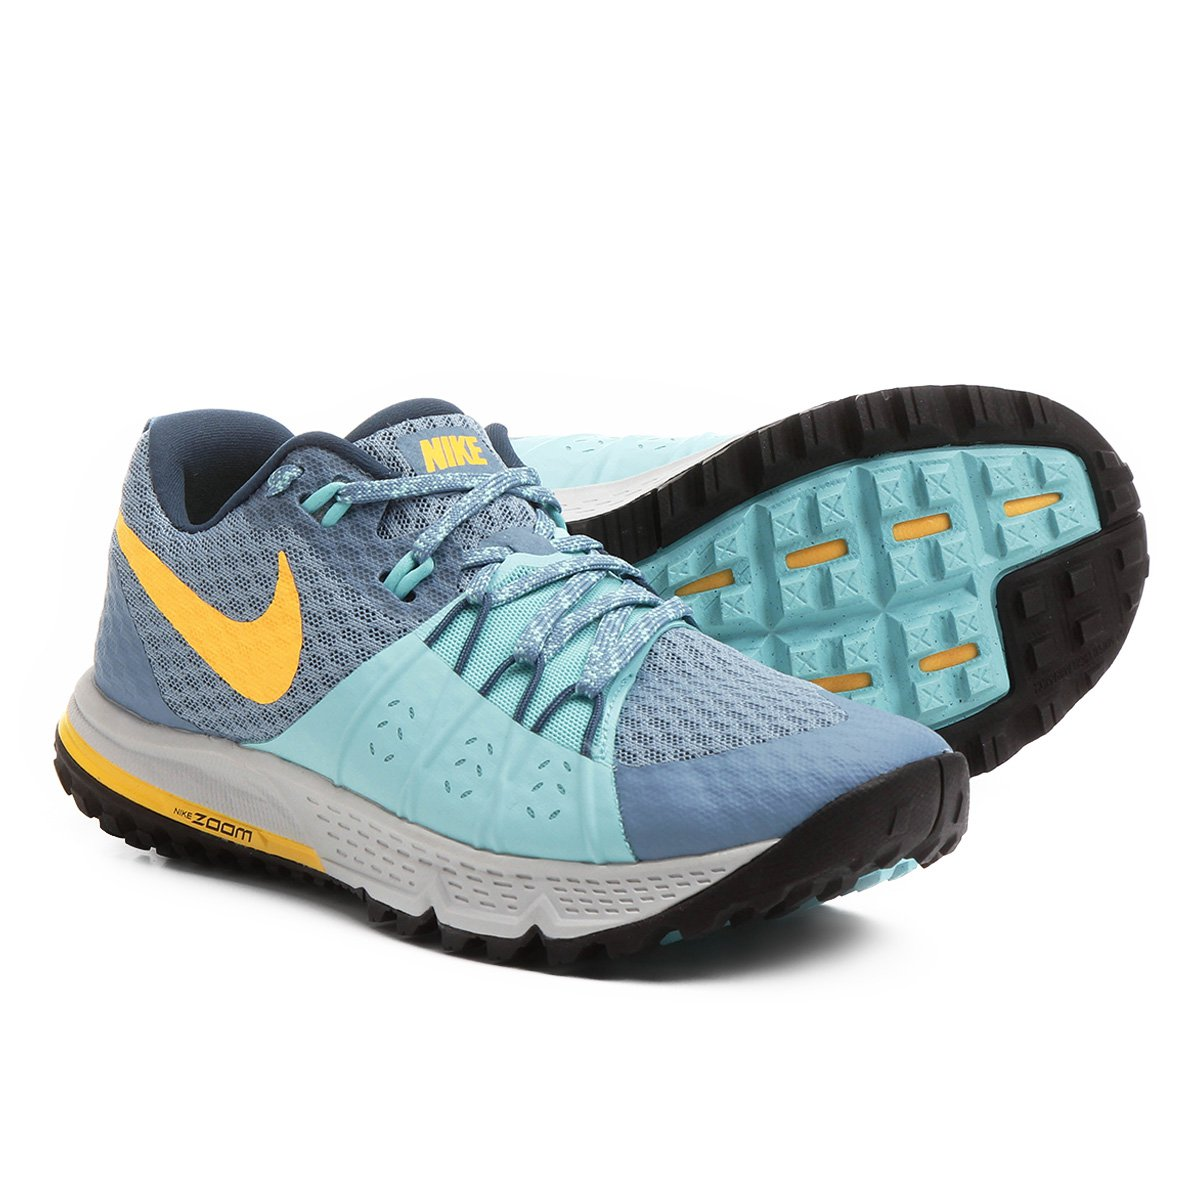 Tênis Nike Air Zoom Wildhorse 4 Feminino - Compre Agora  53b64156ed5d2